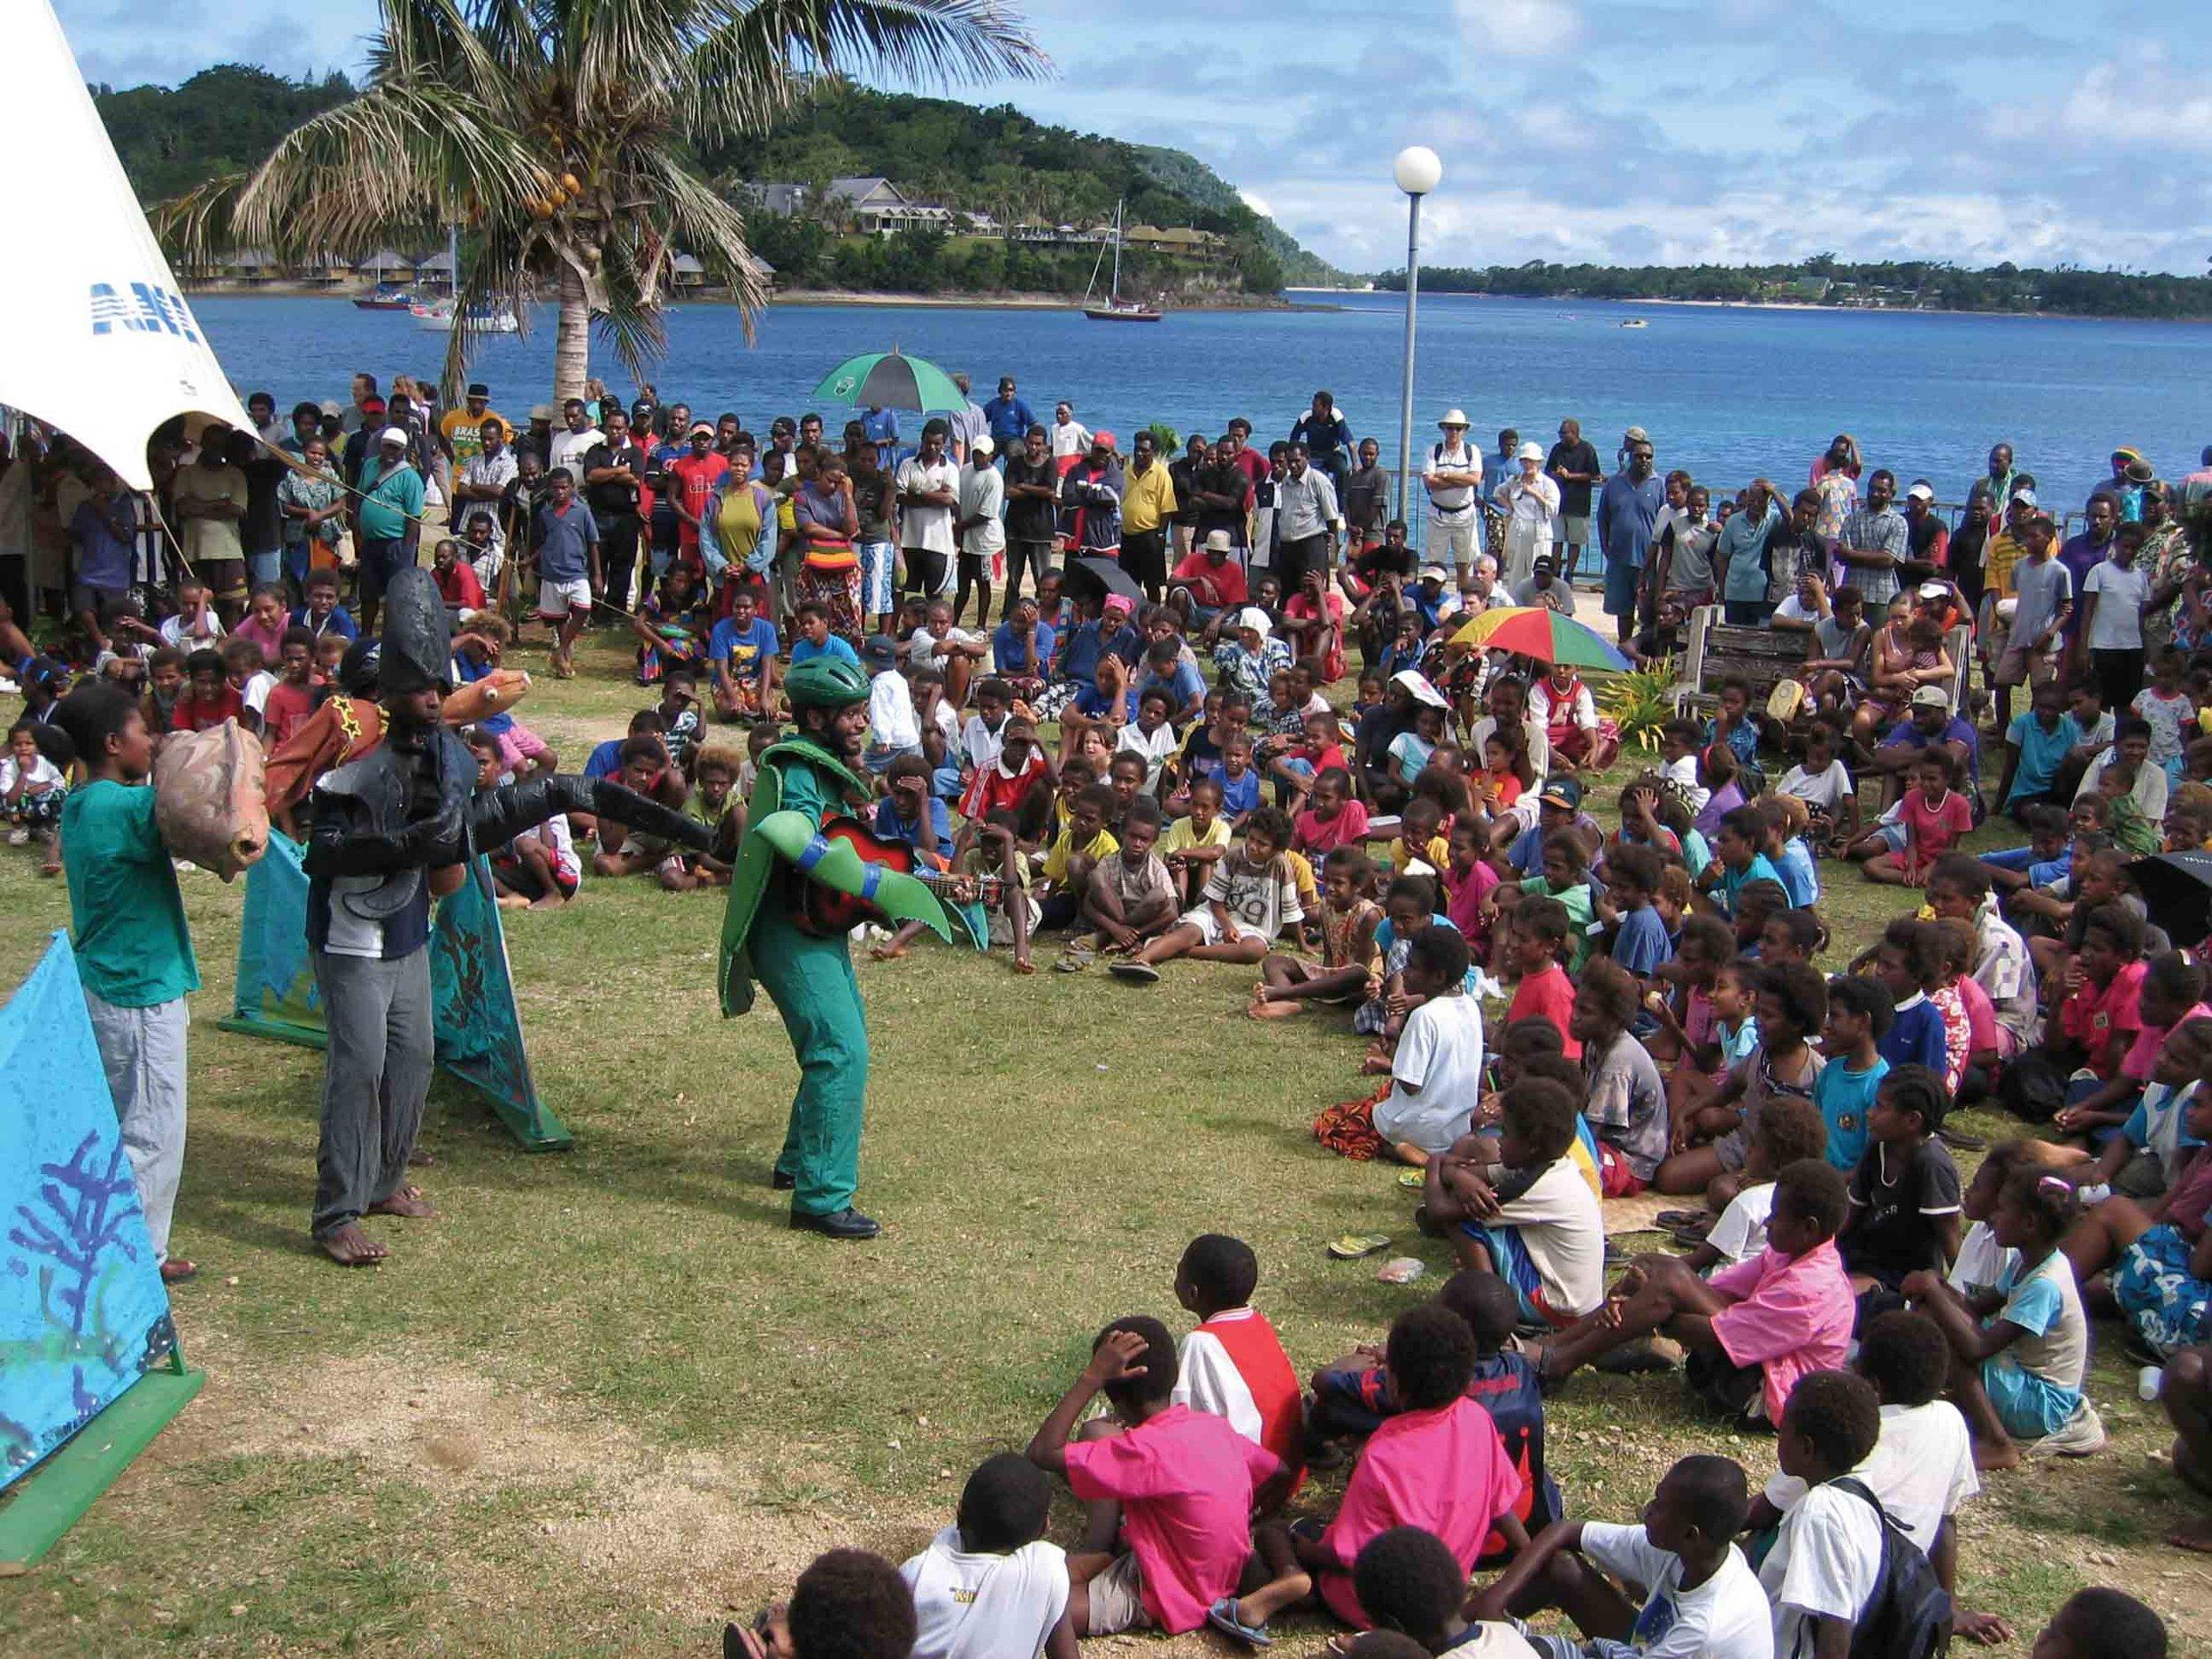 Villagers in Tanoliu, Vanuatu, celebrate the launch of Wan Smolbag's new sea turtle education project. © WAN SMOLBAG